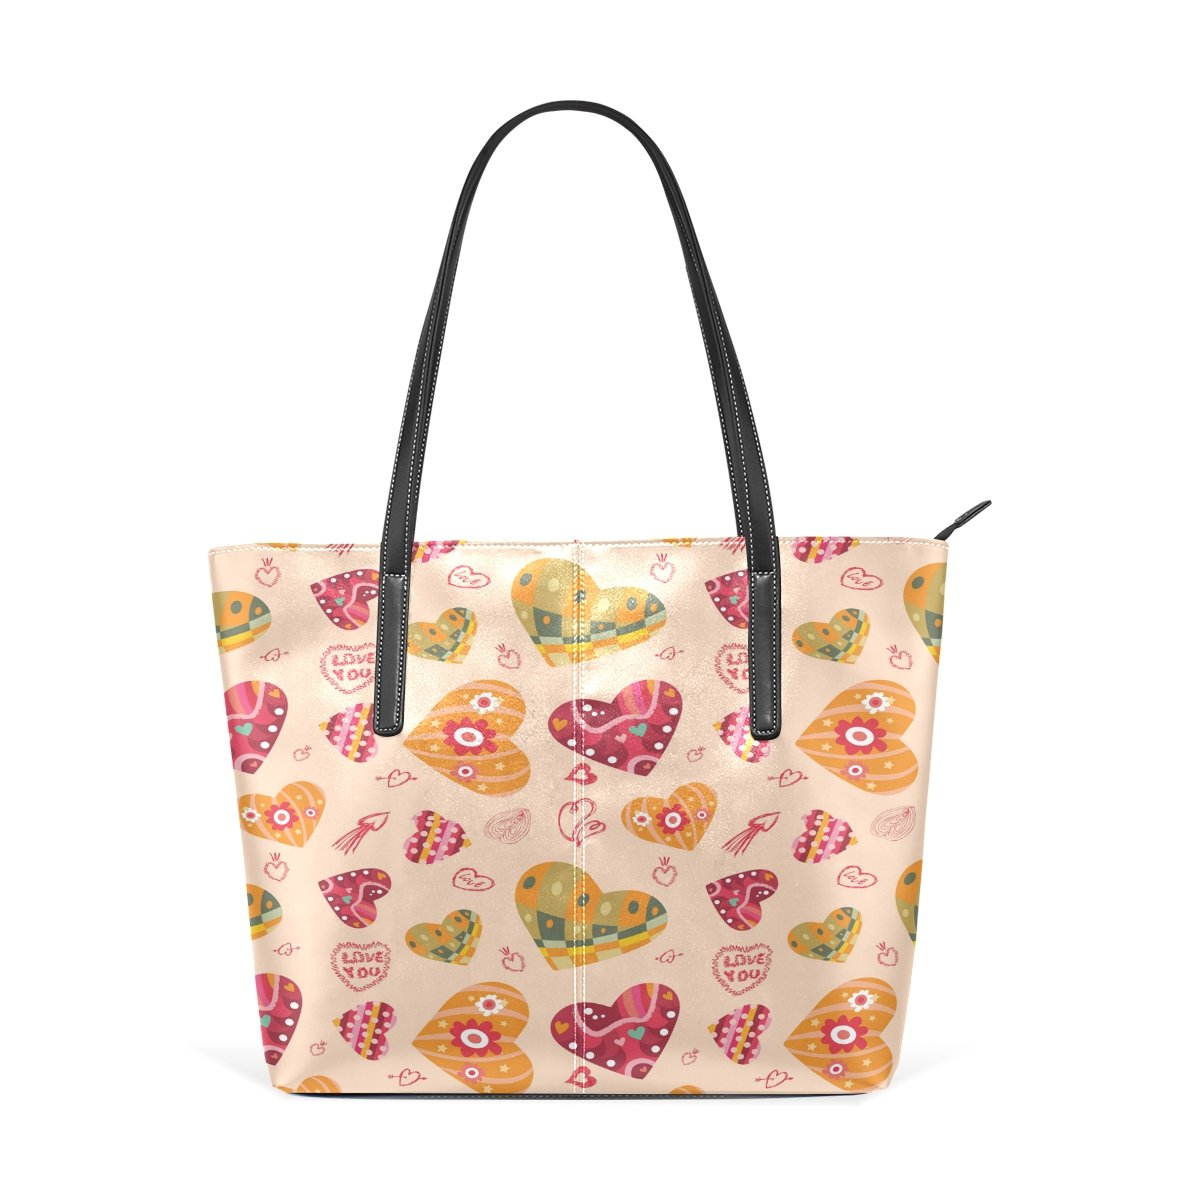 Womens Leather Top Handle Shoulder Handbag Heart Pattern Large Work Tote Bag